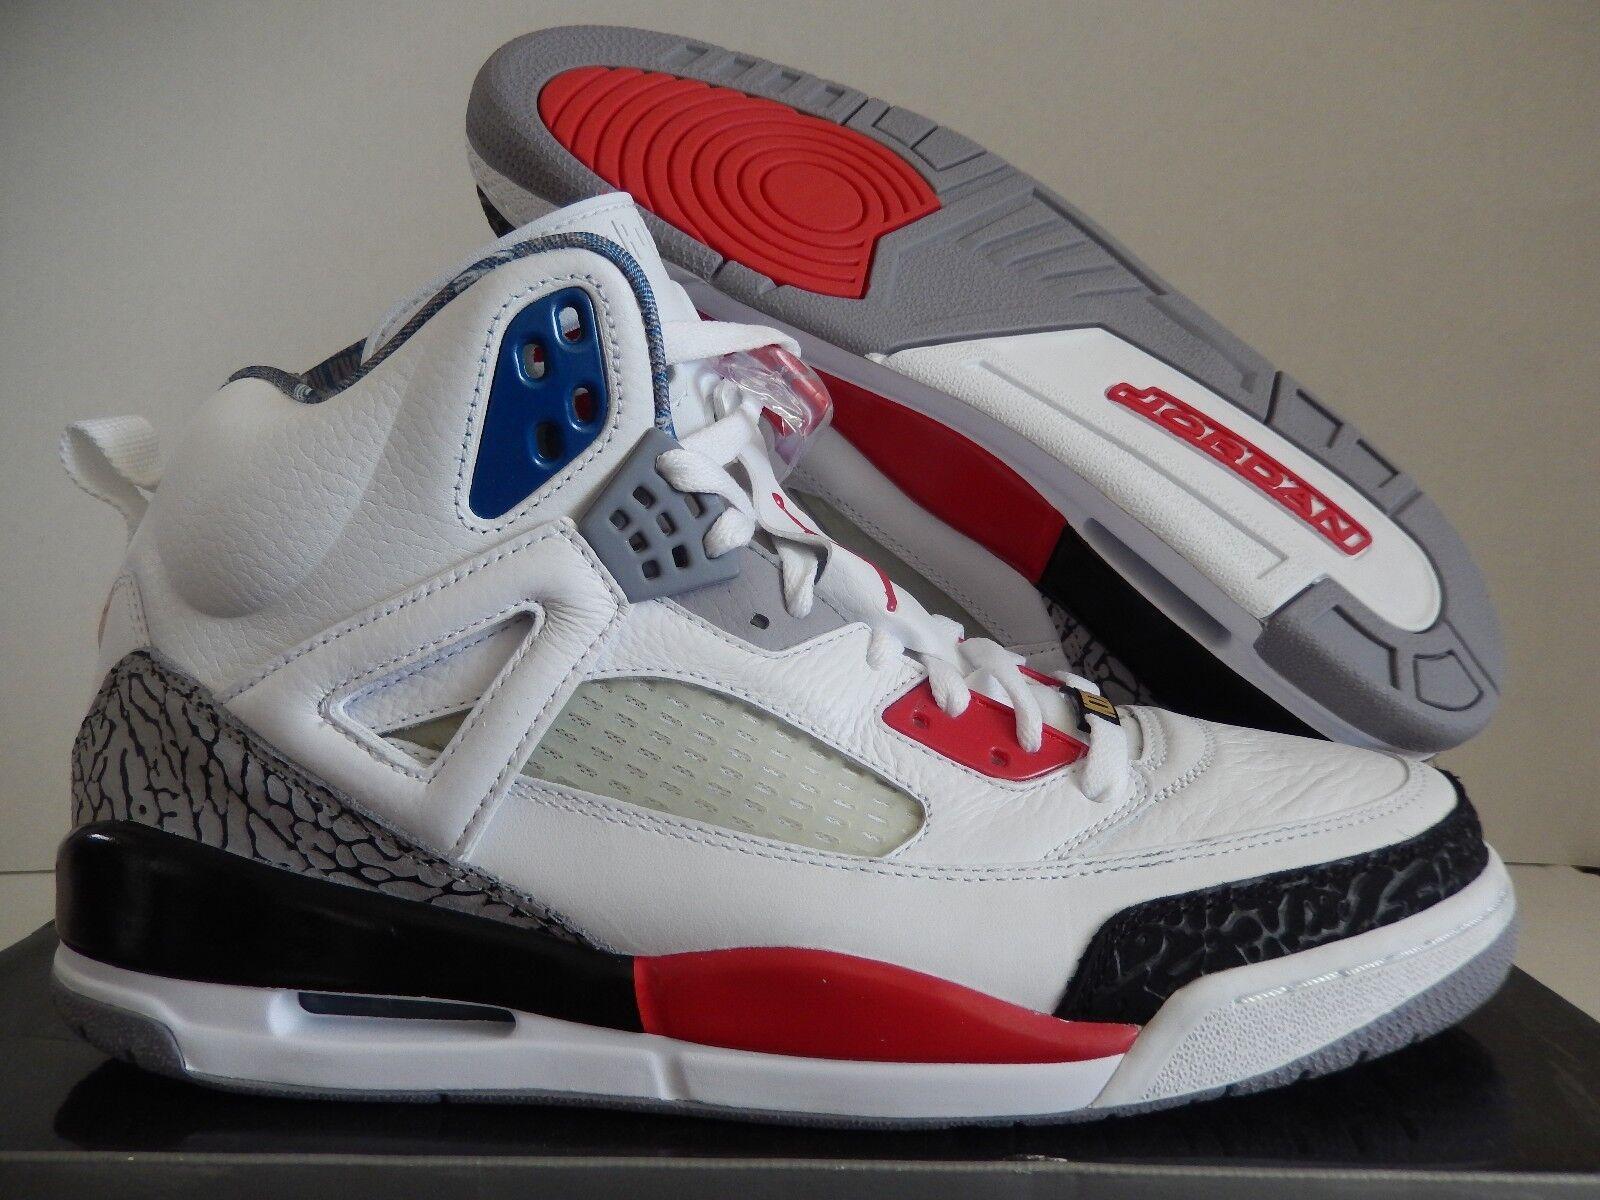 Nike air jordan spizike marte neromon sz 10 rare 2009![315371-165]